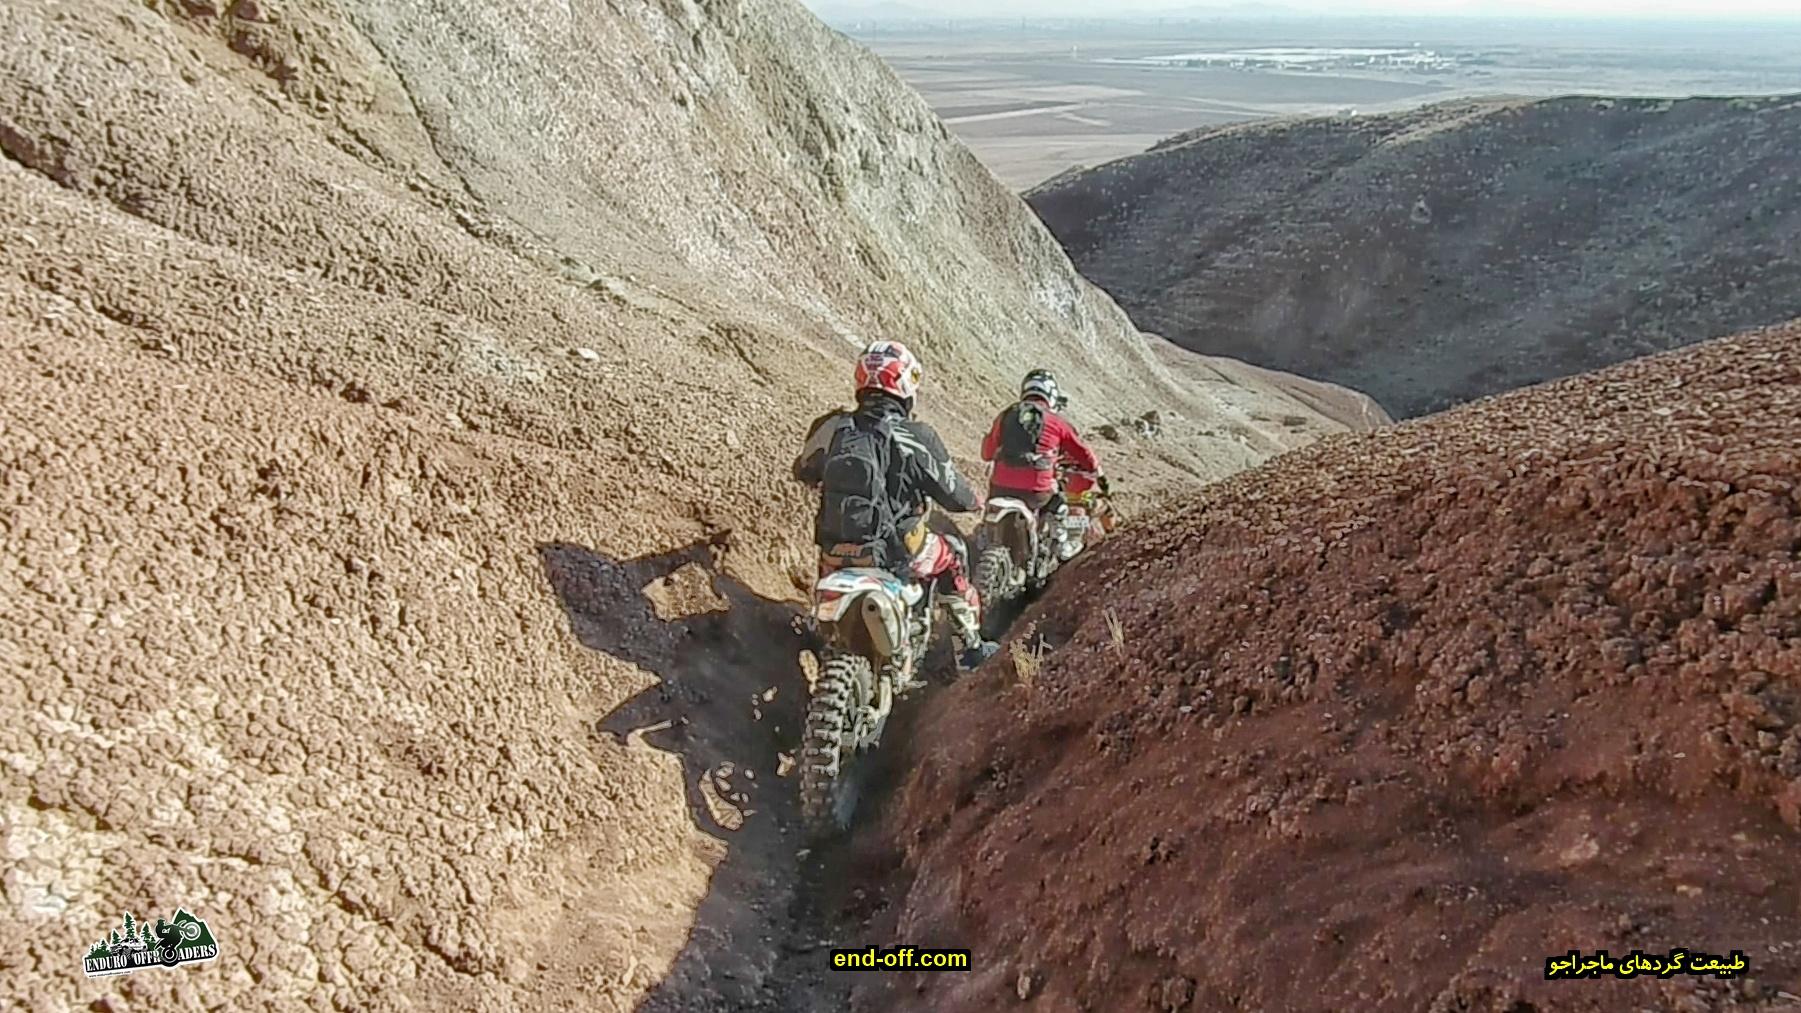 جنوب شرقی منطقه نصرت آباد کرج - زمستان 1399 2021